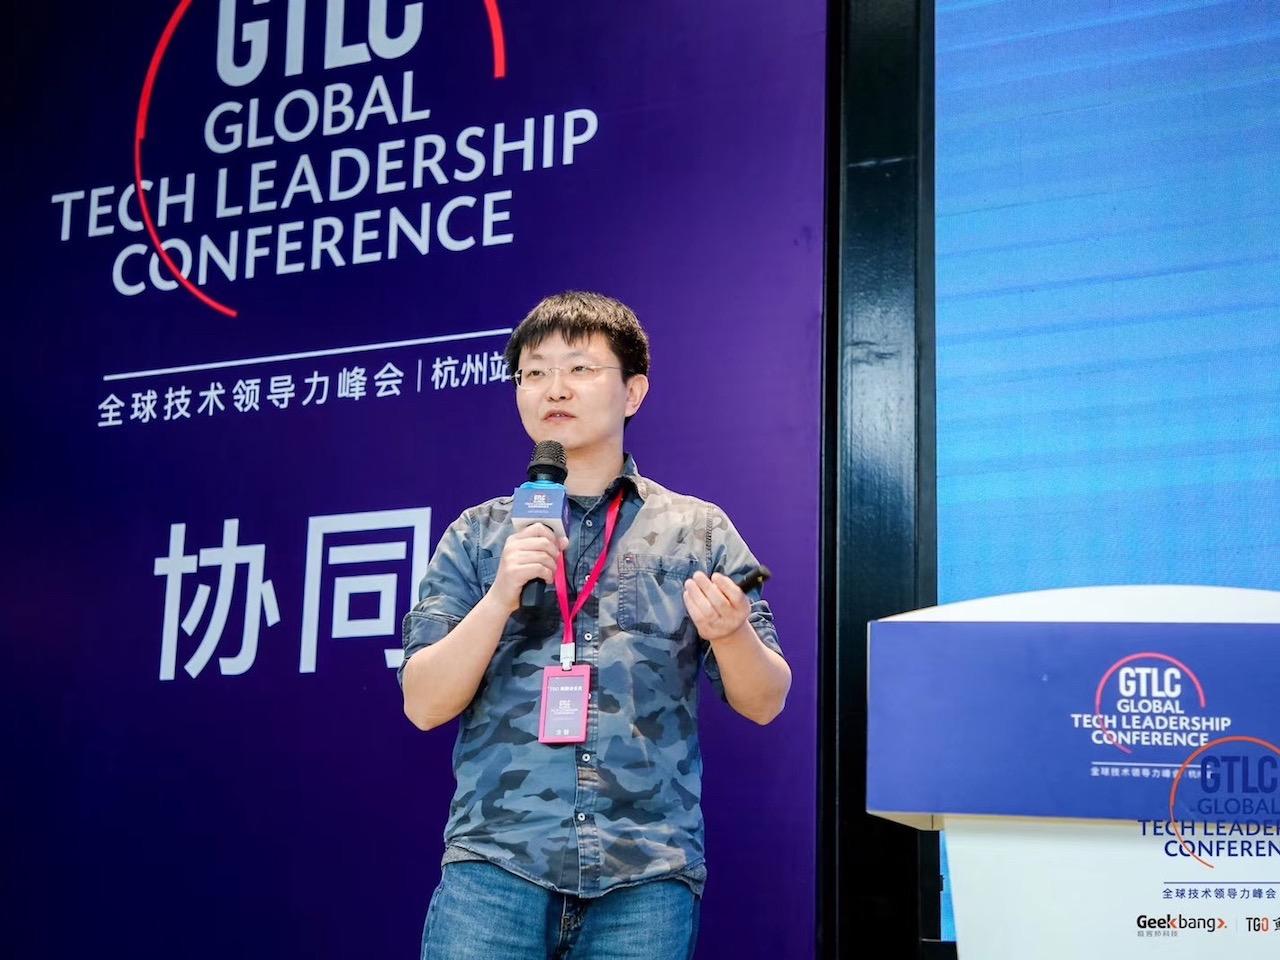 Yang Li Conference Speaking